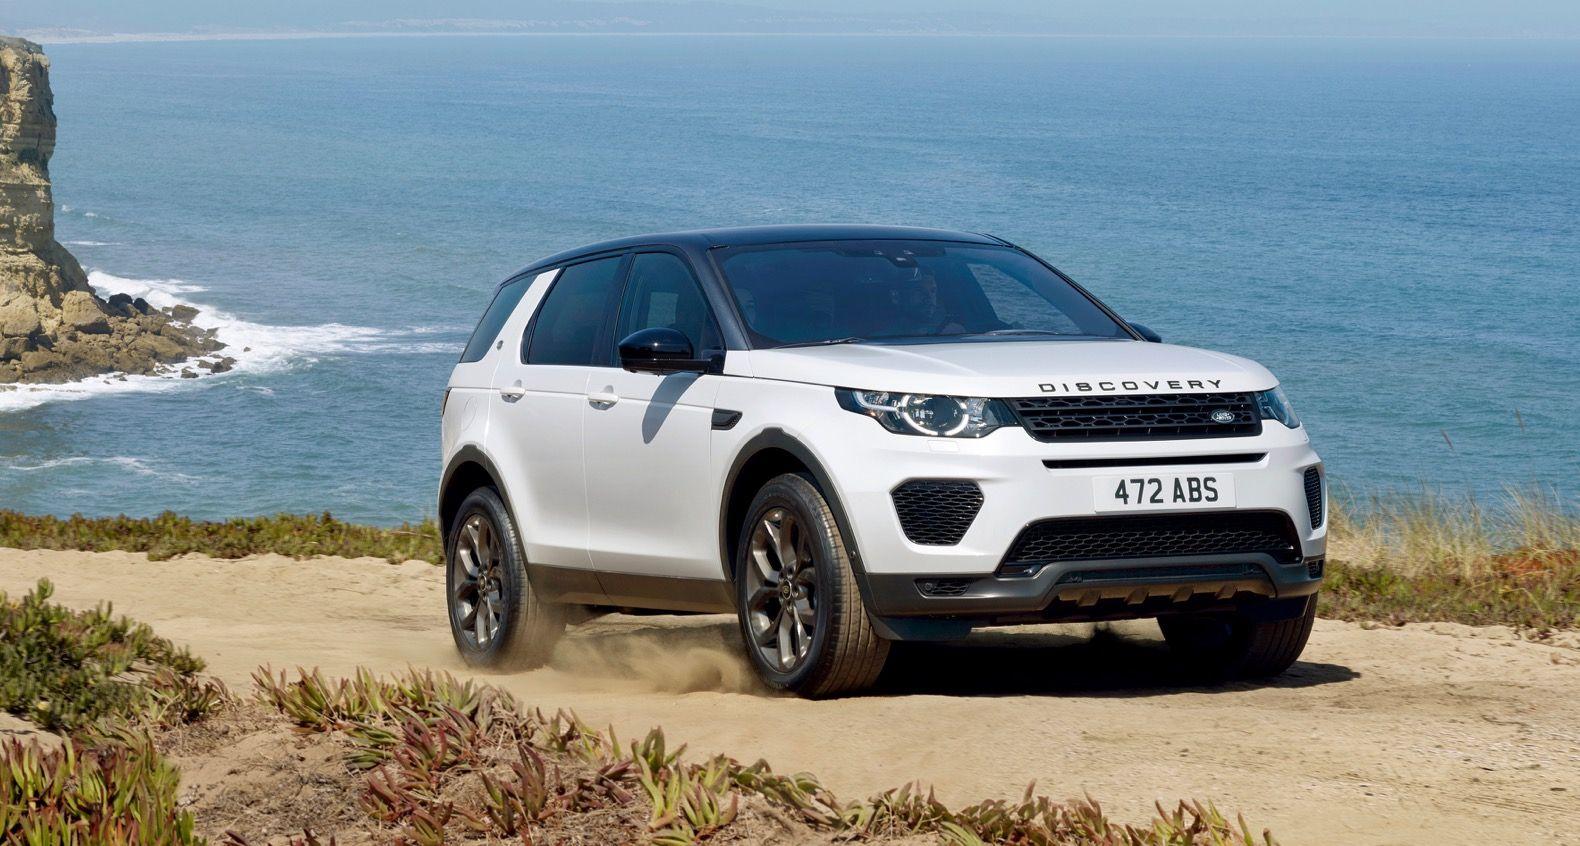 2019 Land Rover Discovery Sport Landmark edition Land